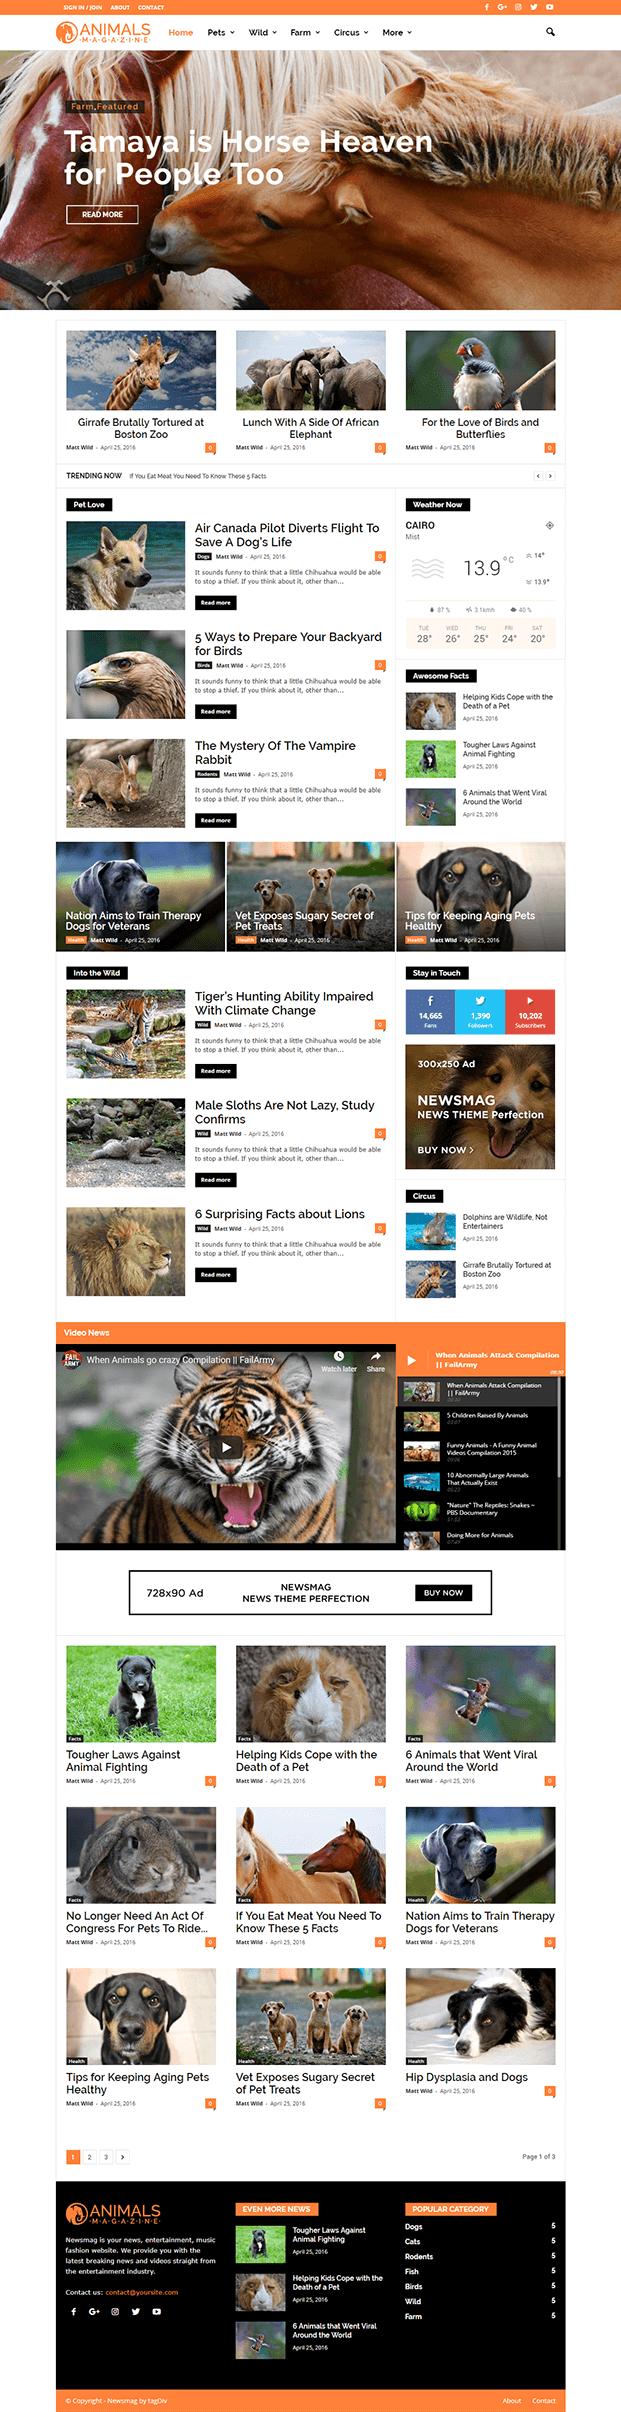 Home - Editorial WordPress Theme